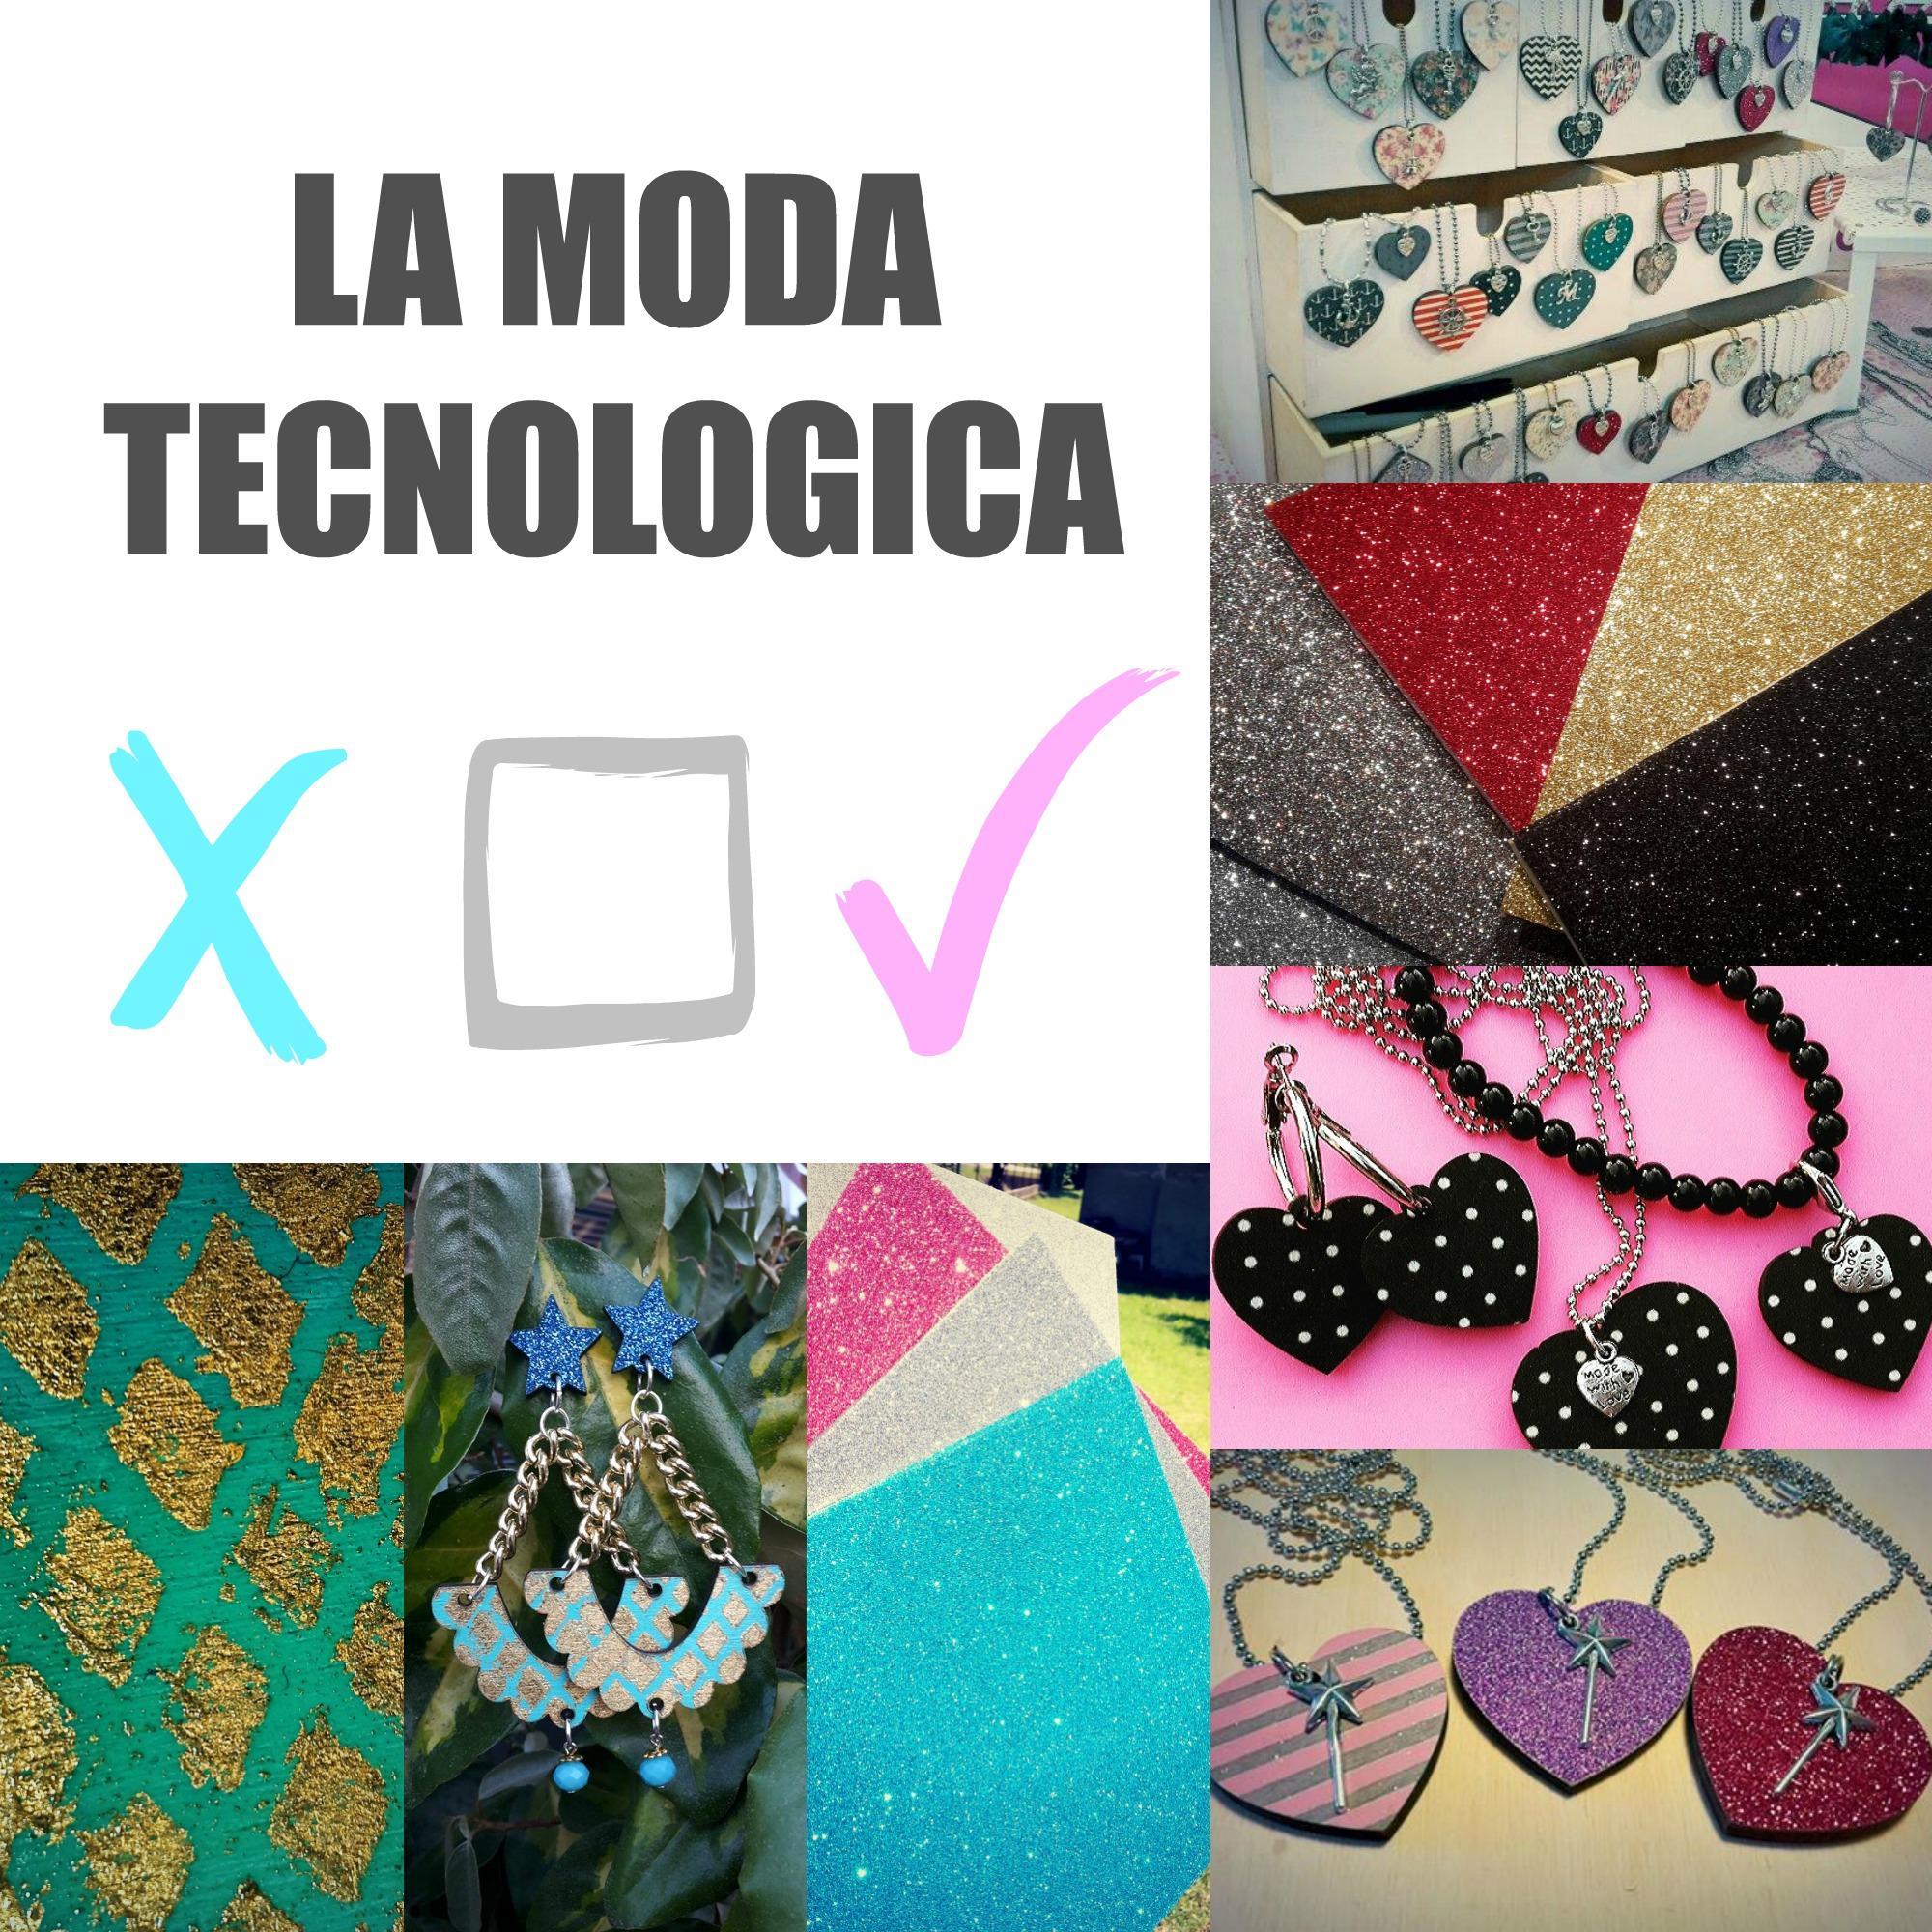 La moda tecnologica